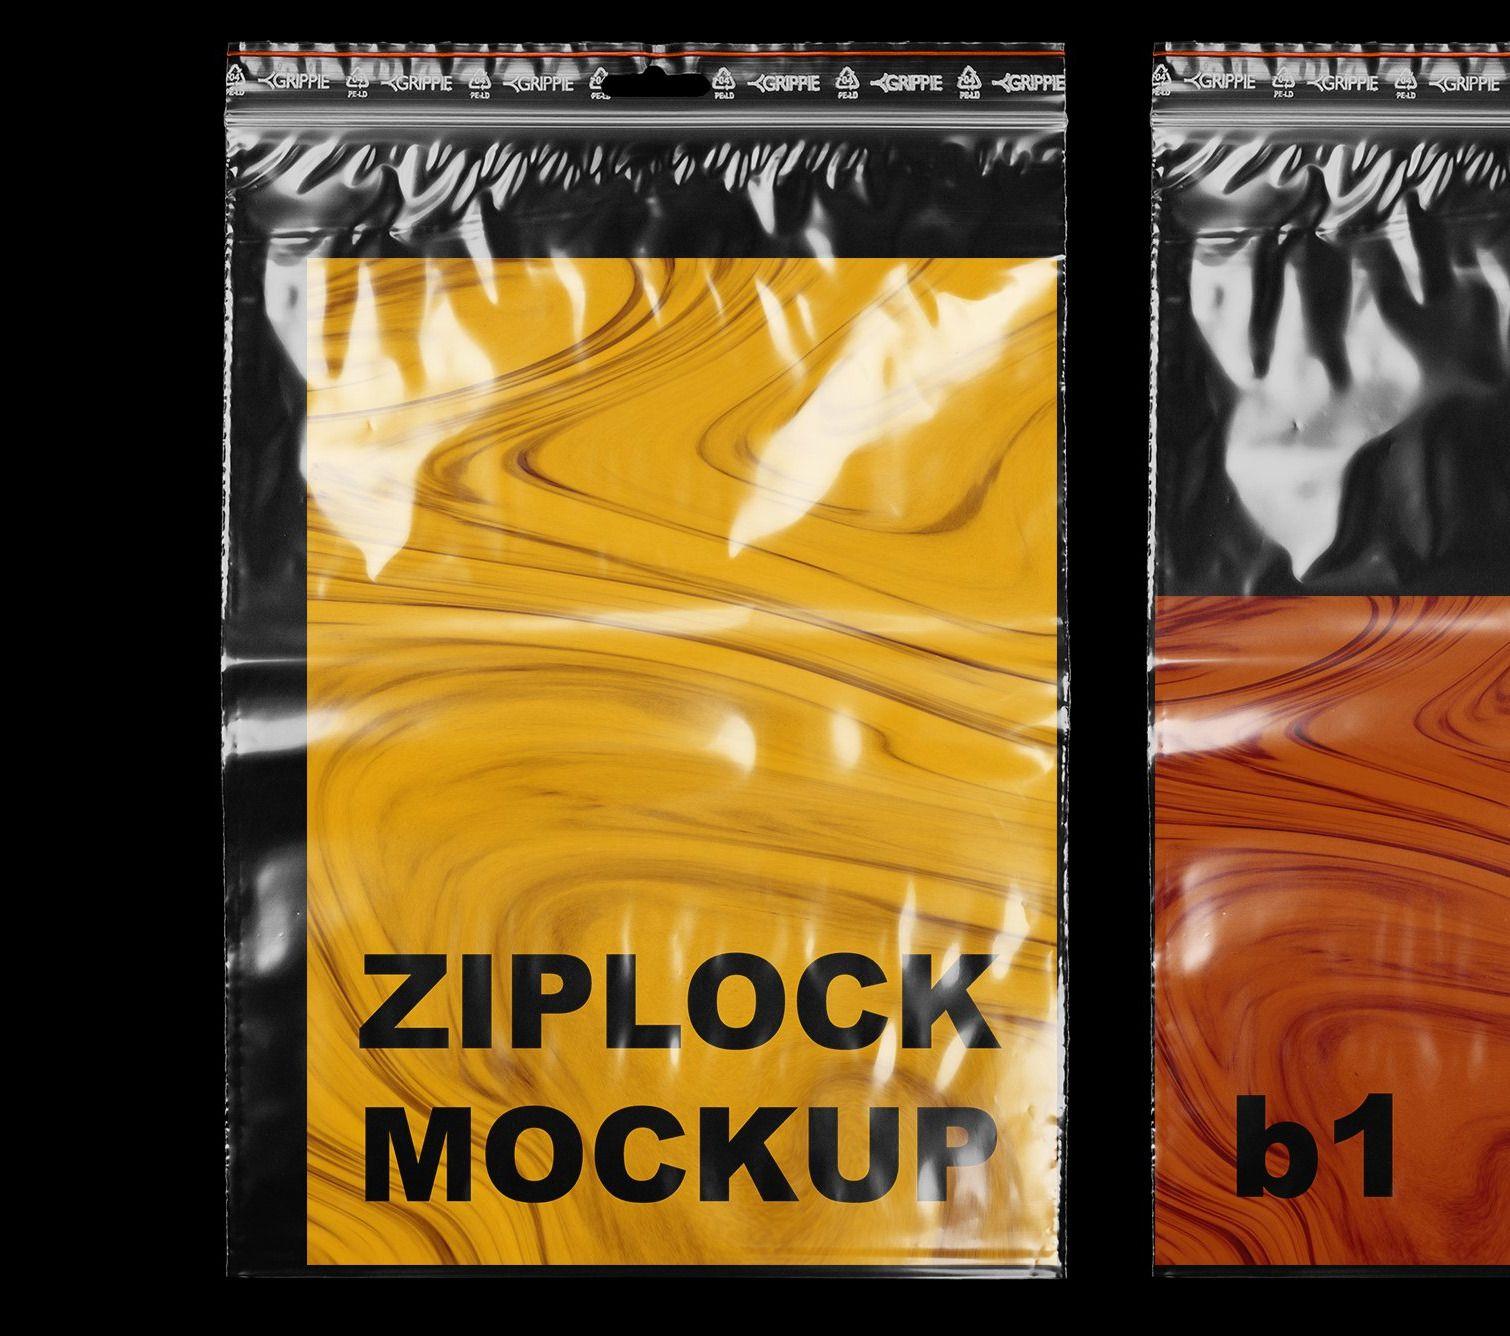 Download Ziplock Bag Mockup Graphic Design Lessons Texture Graphic Design Bag Mockup